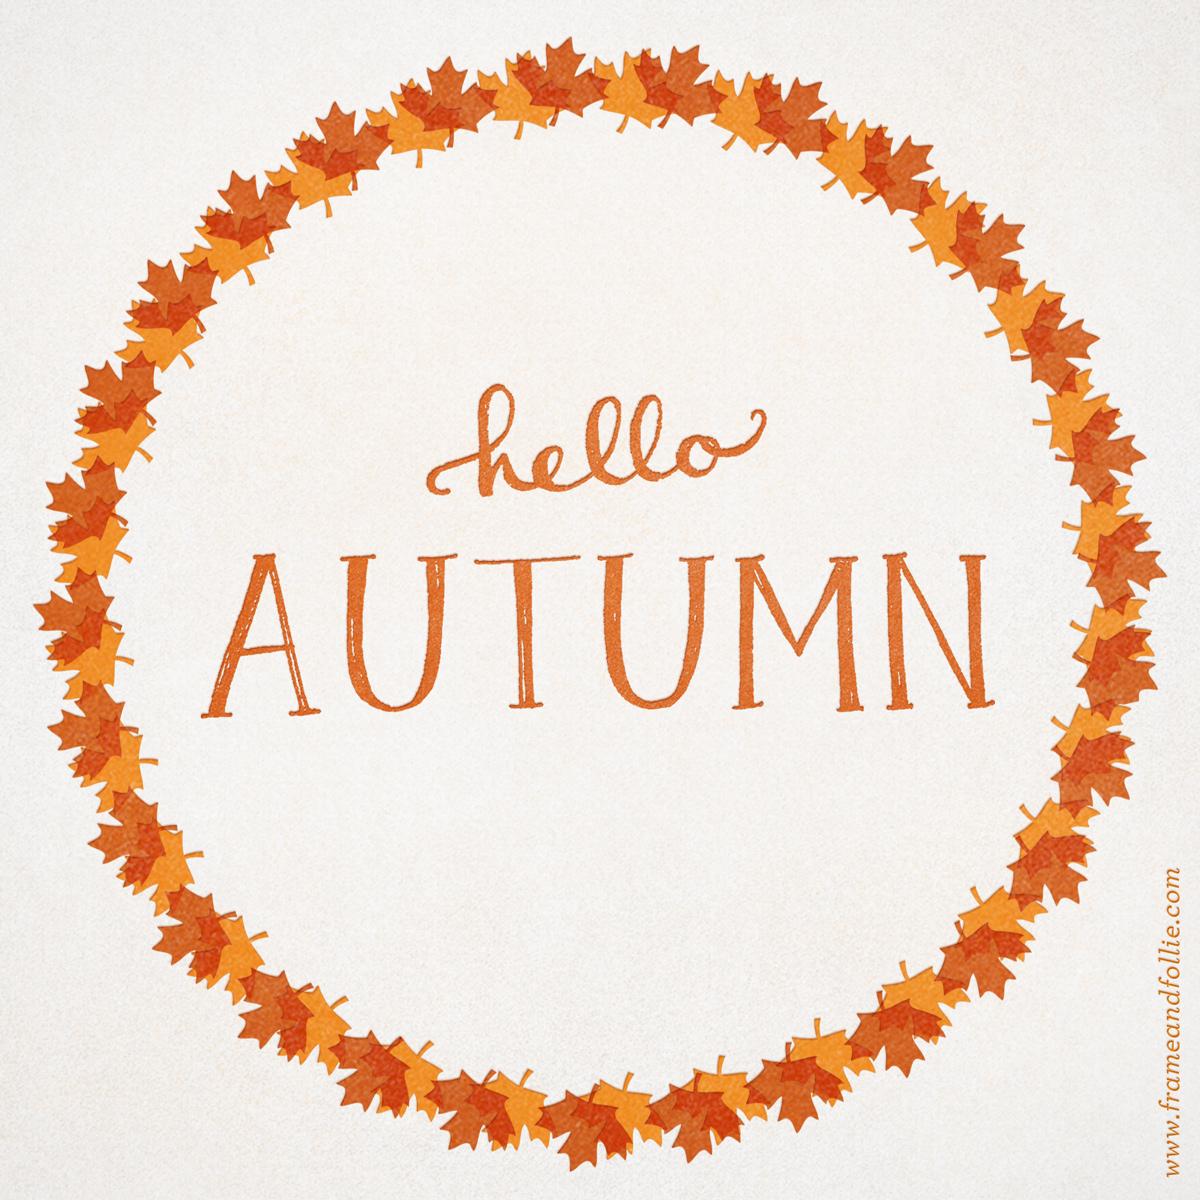 Tumblr Fall Quotes: Welcome Autumn Quotes. QuotesGram